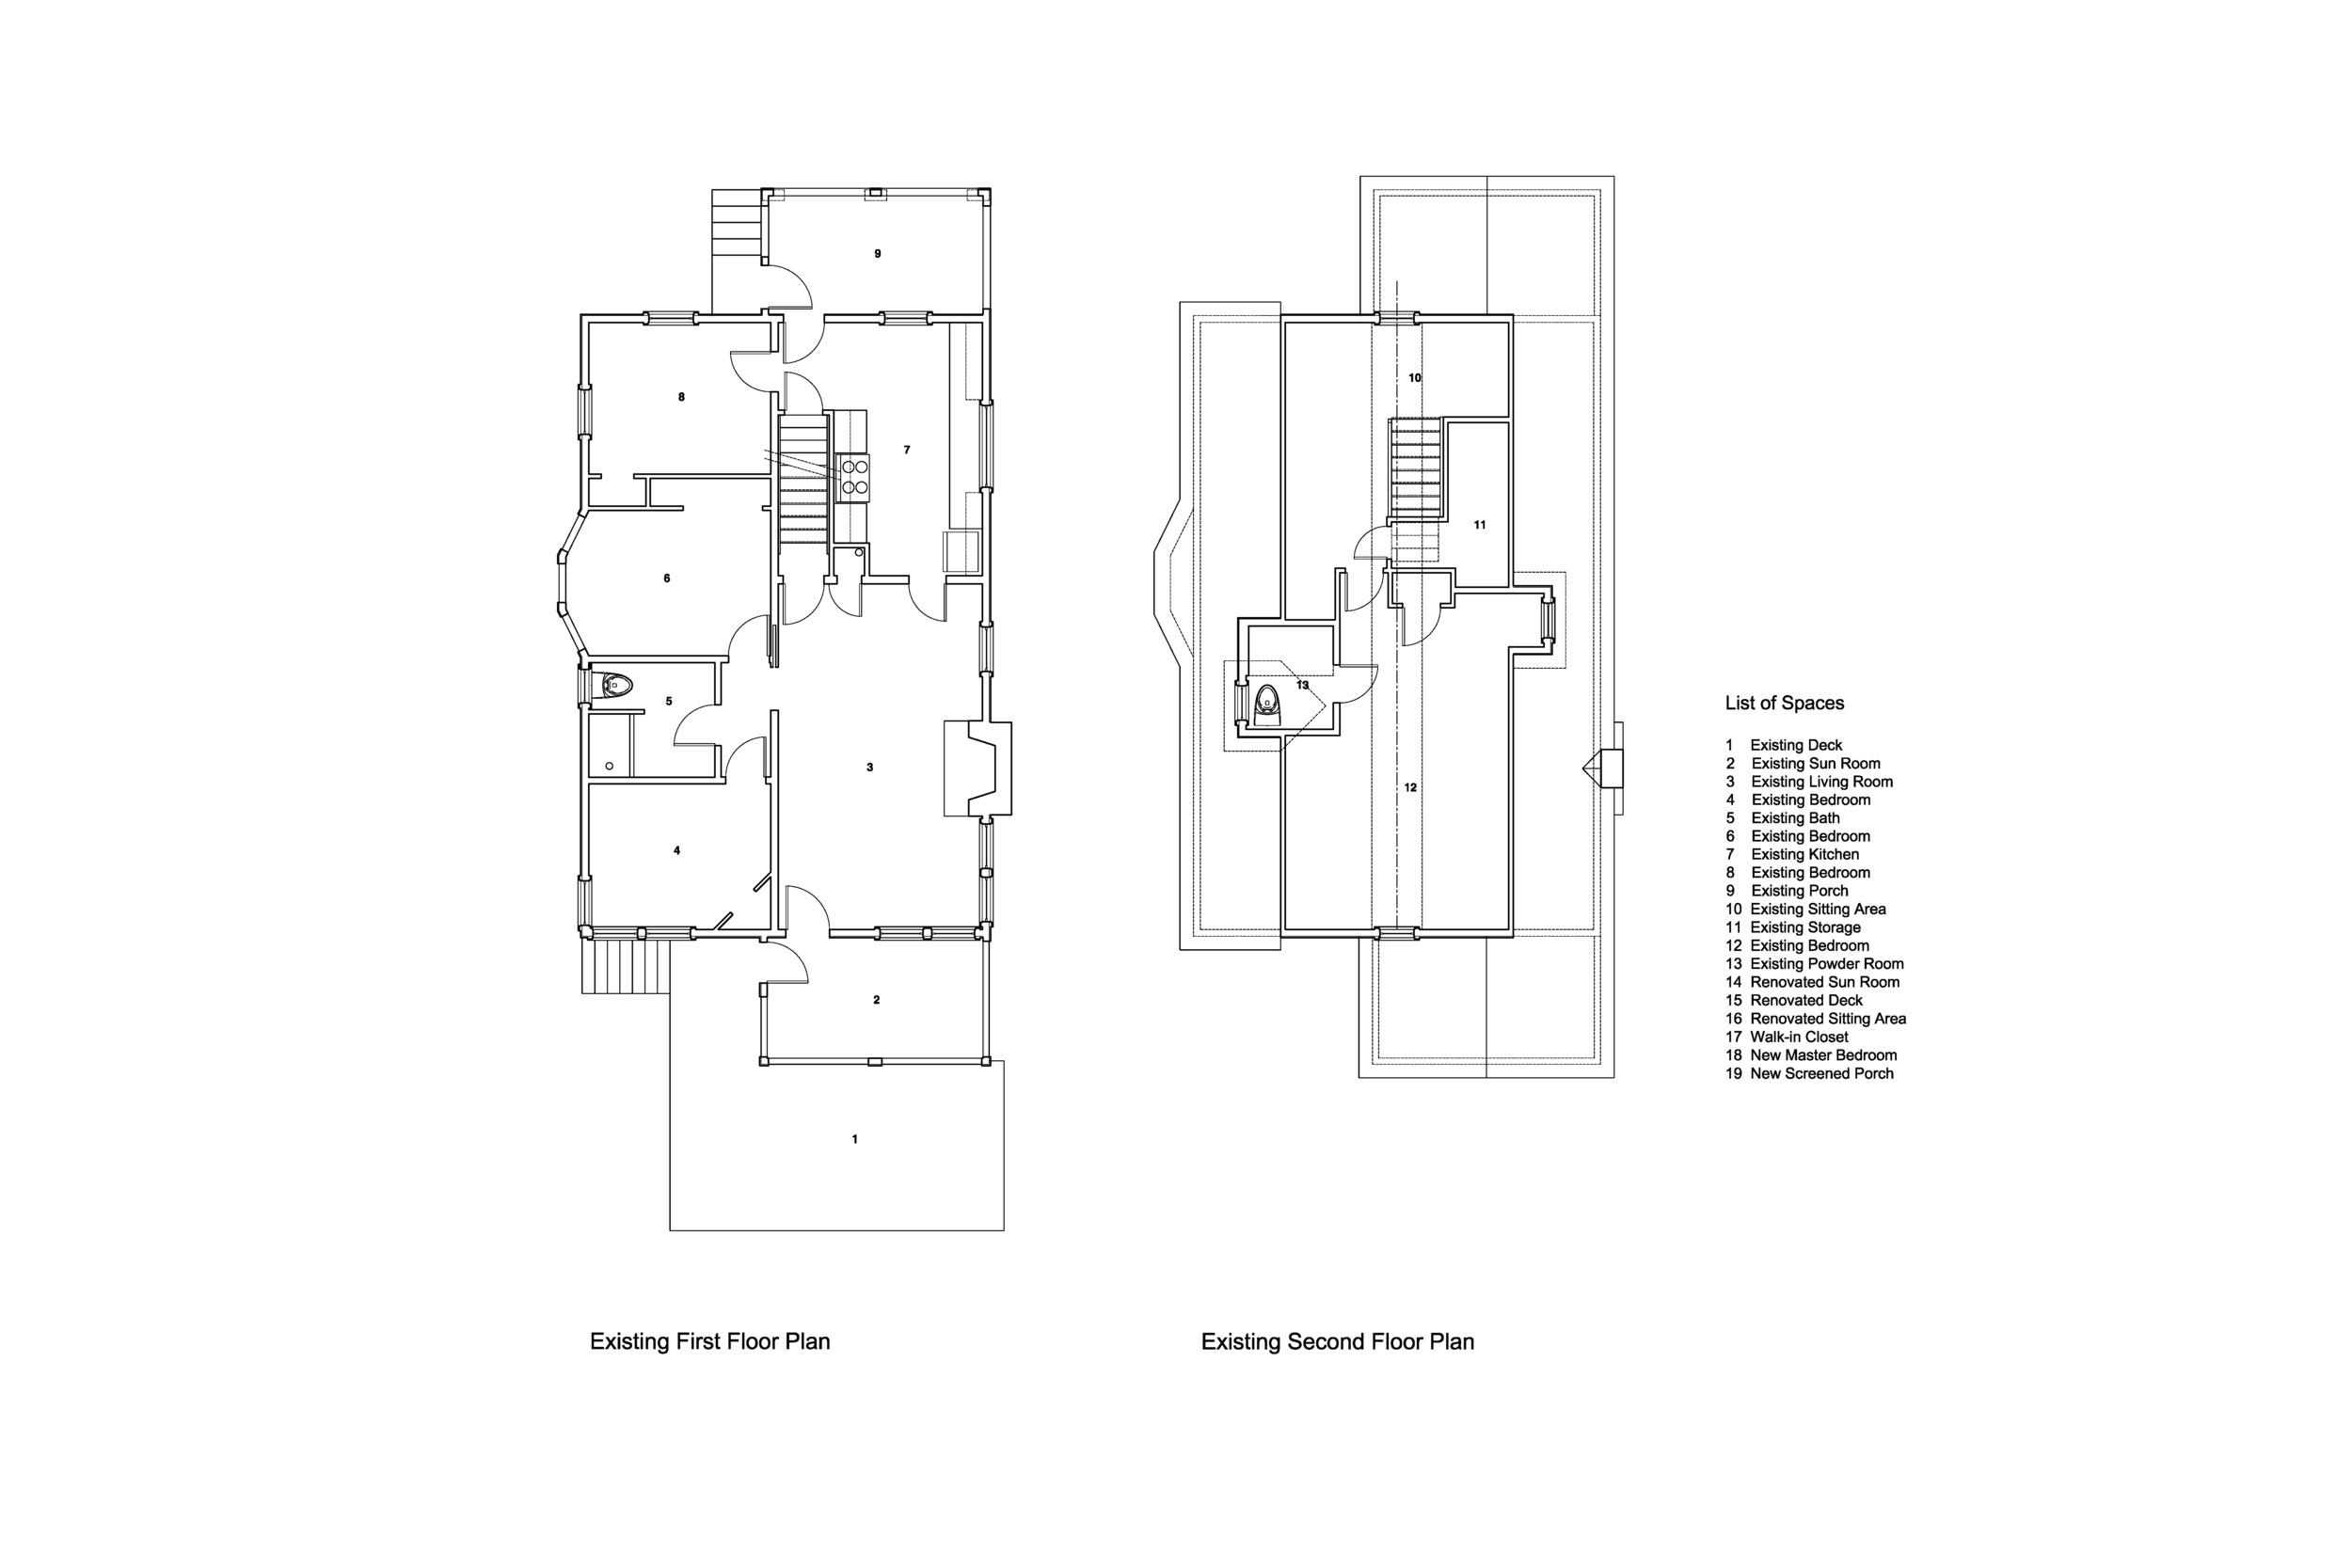 2014MDA_exist_floor_plans_marvel.jpg